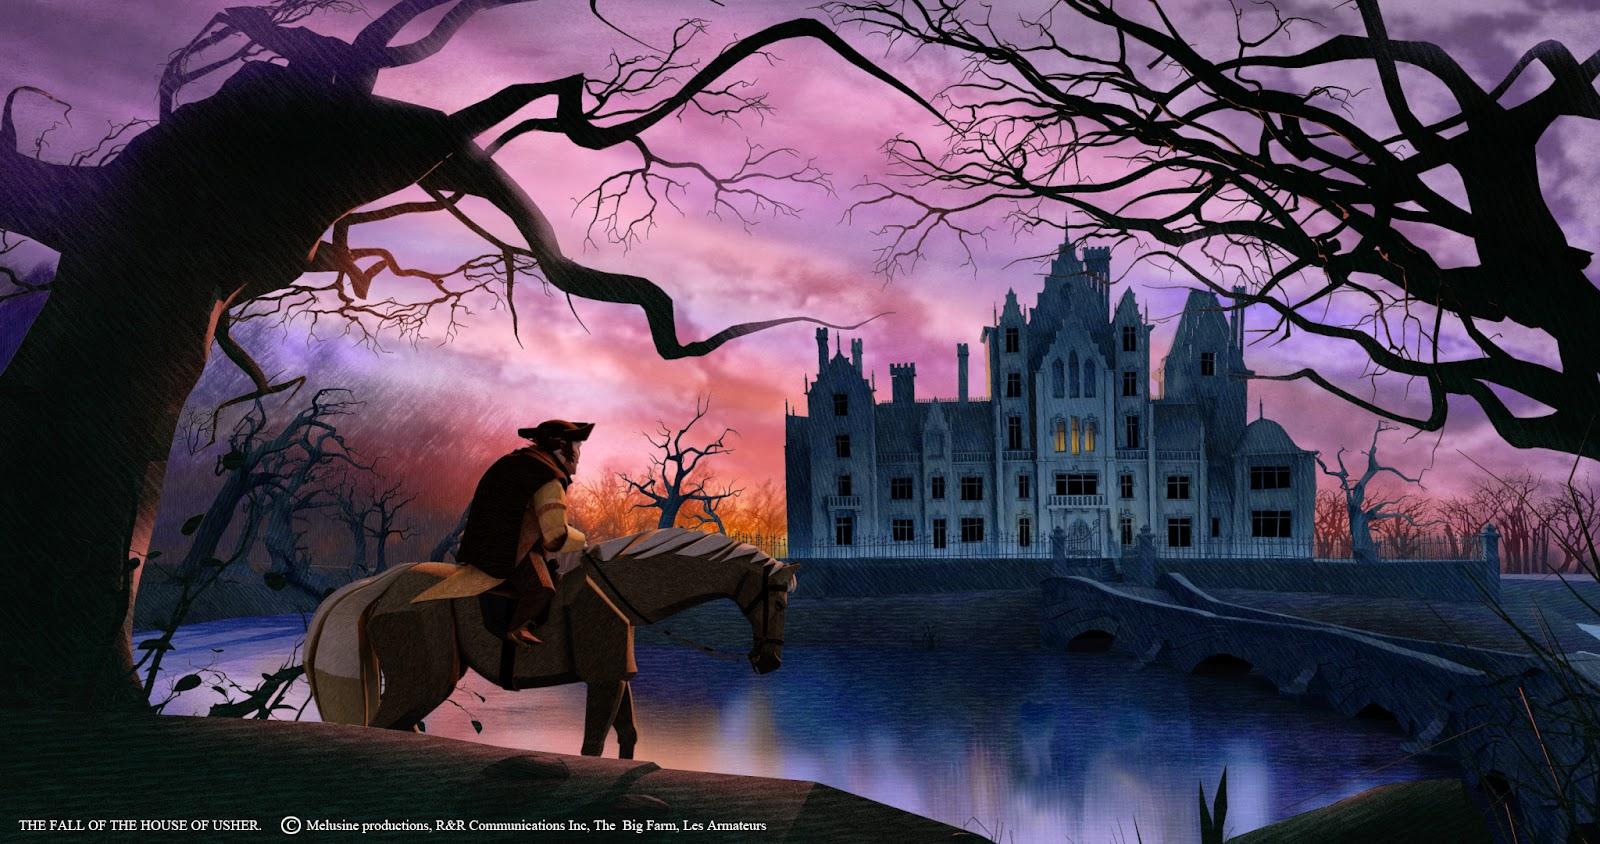 Edgar Allan Poe LA CADA DE LA CASA USHER  THE FALL OF THE HOUSE OF USHER  Los Seores del Edn